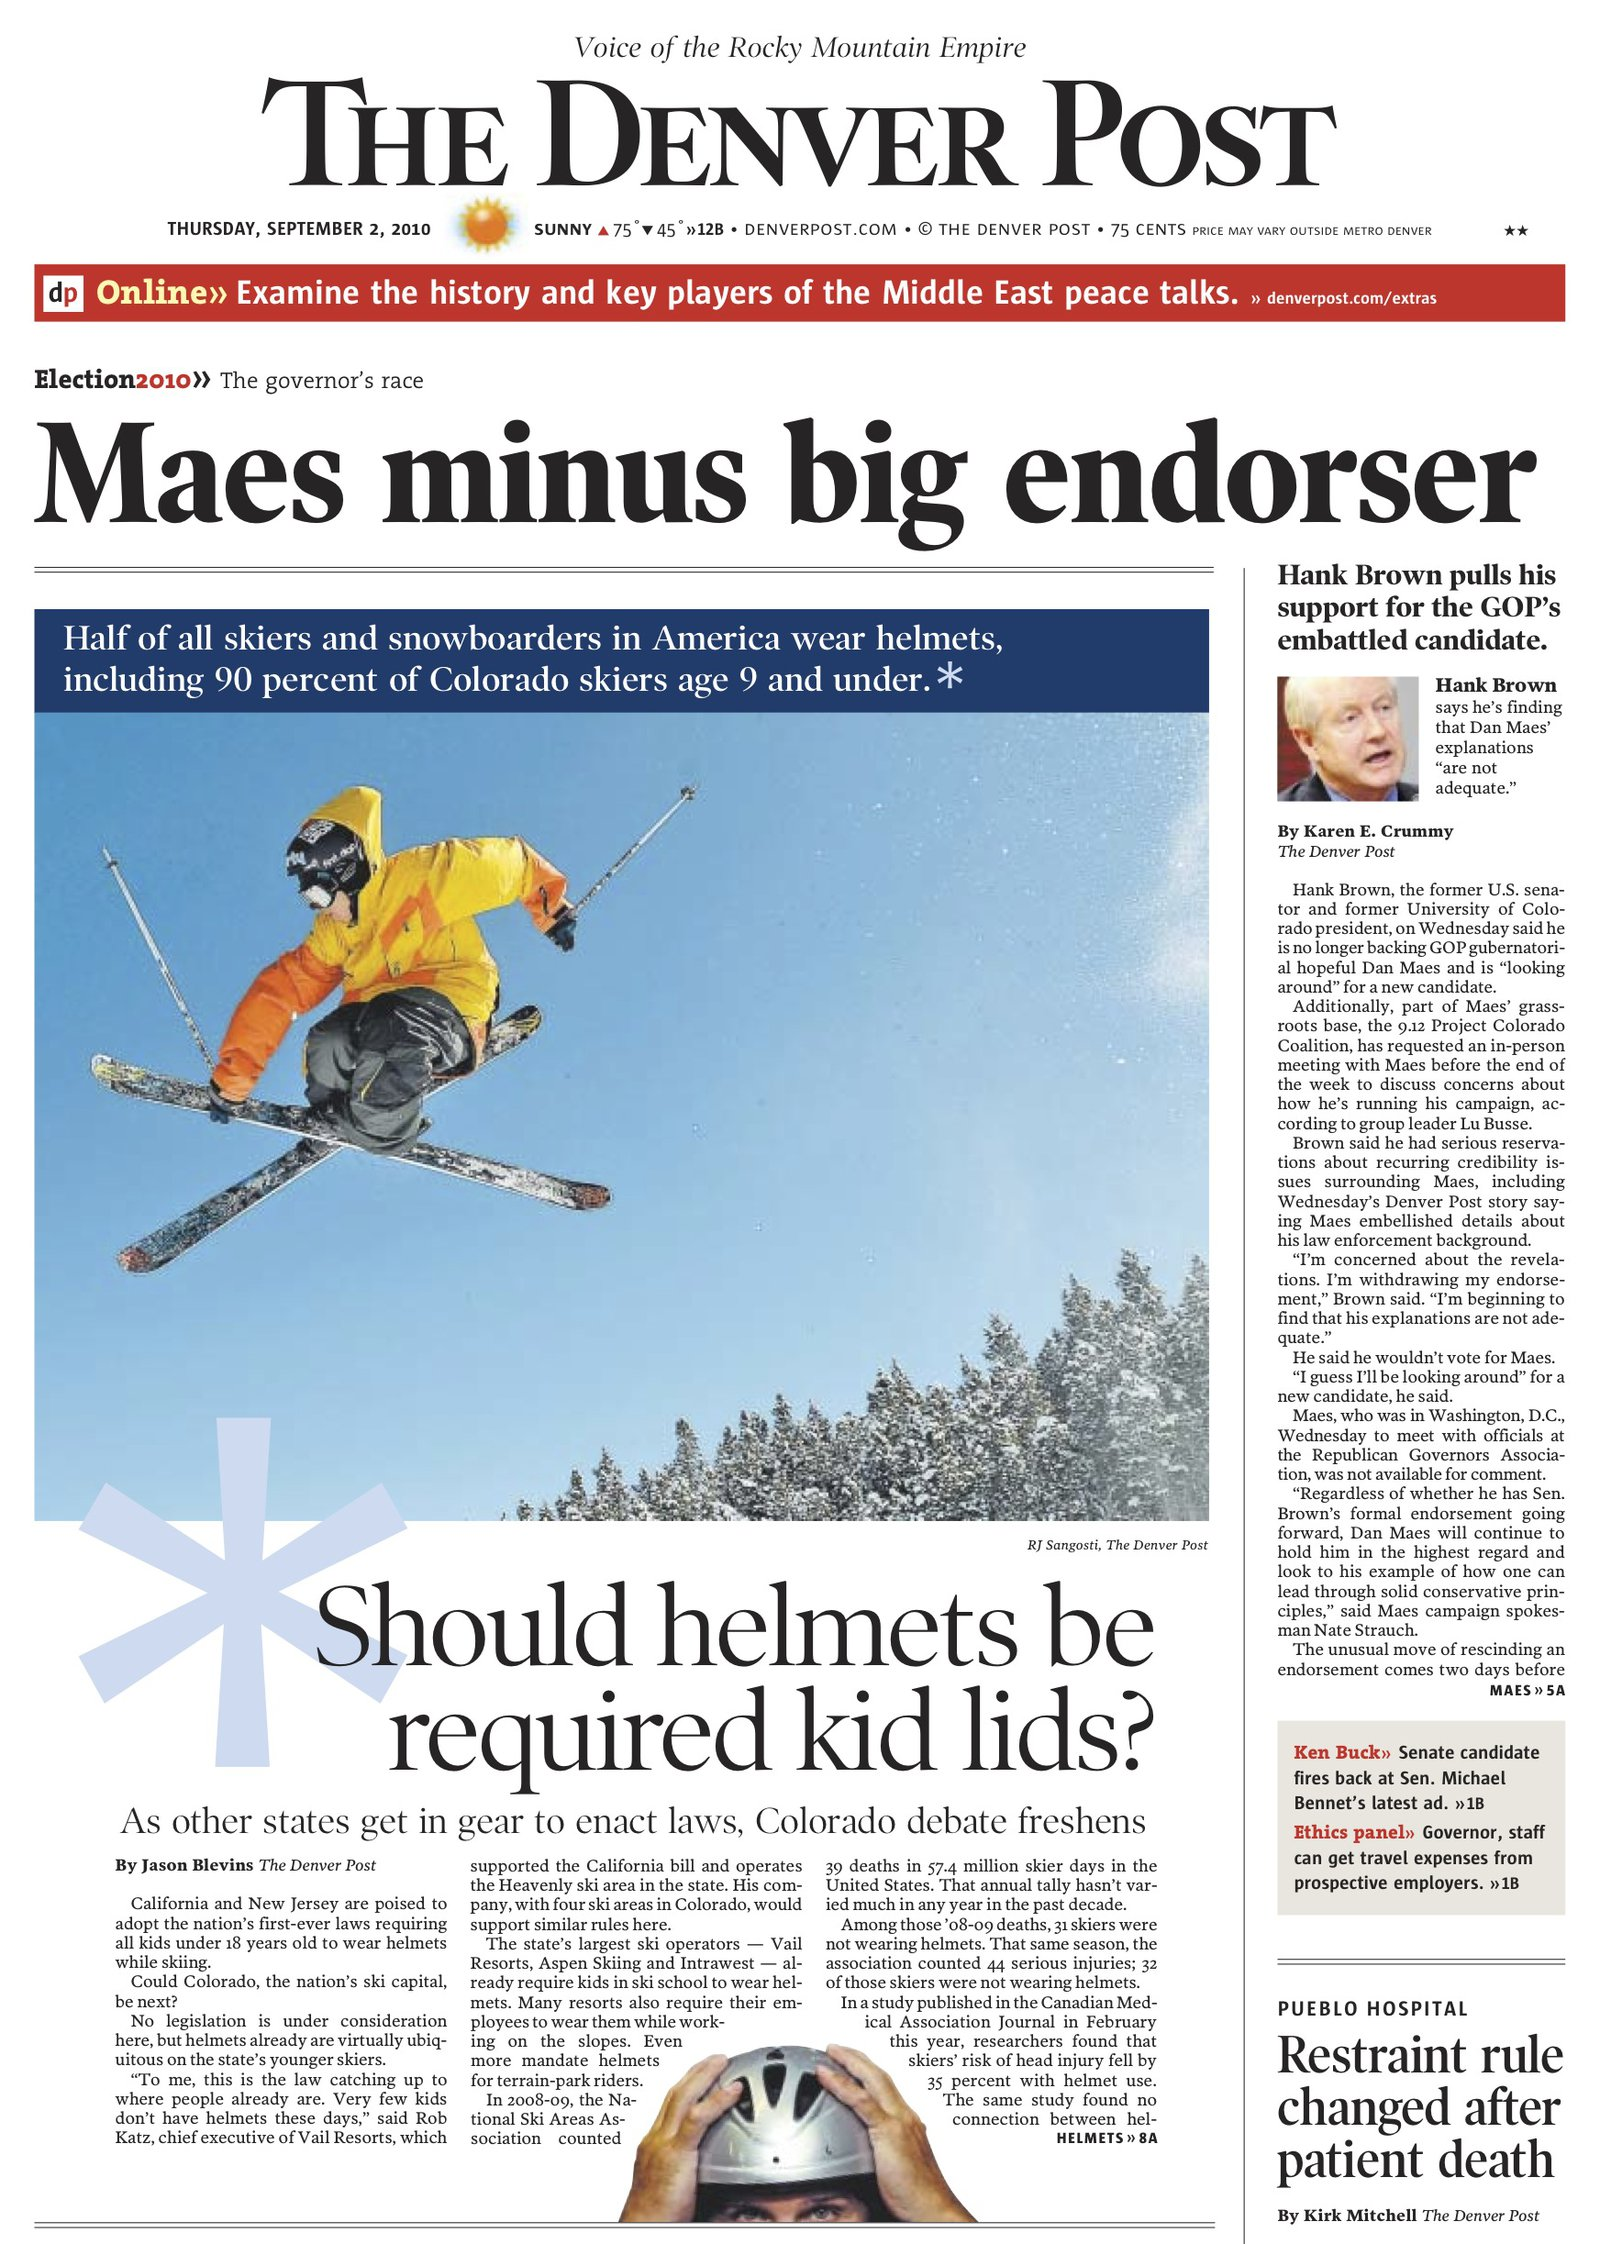 David Lesh/ First Drop front page Denver Post